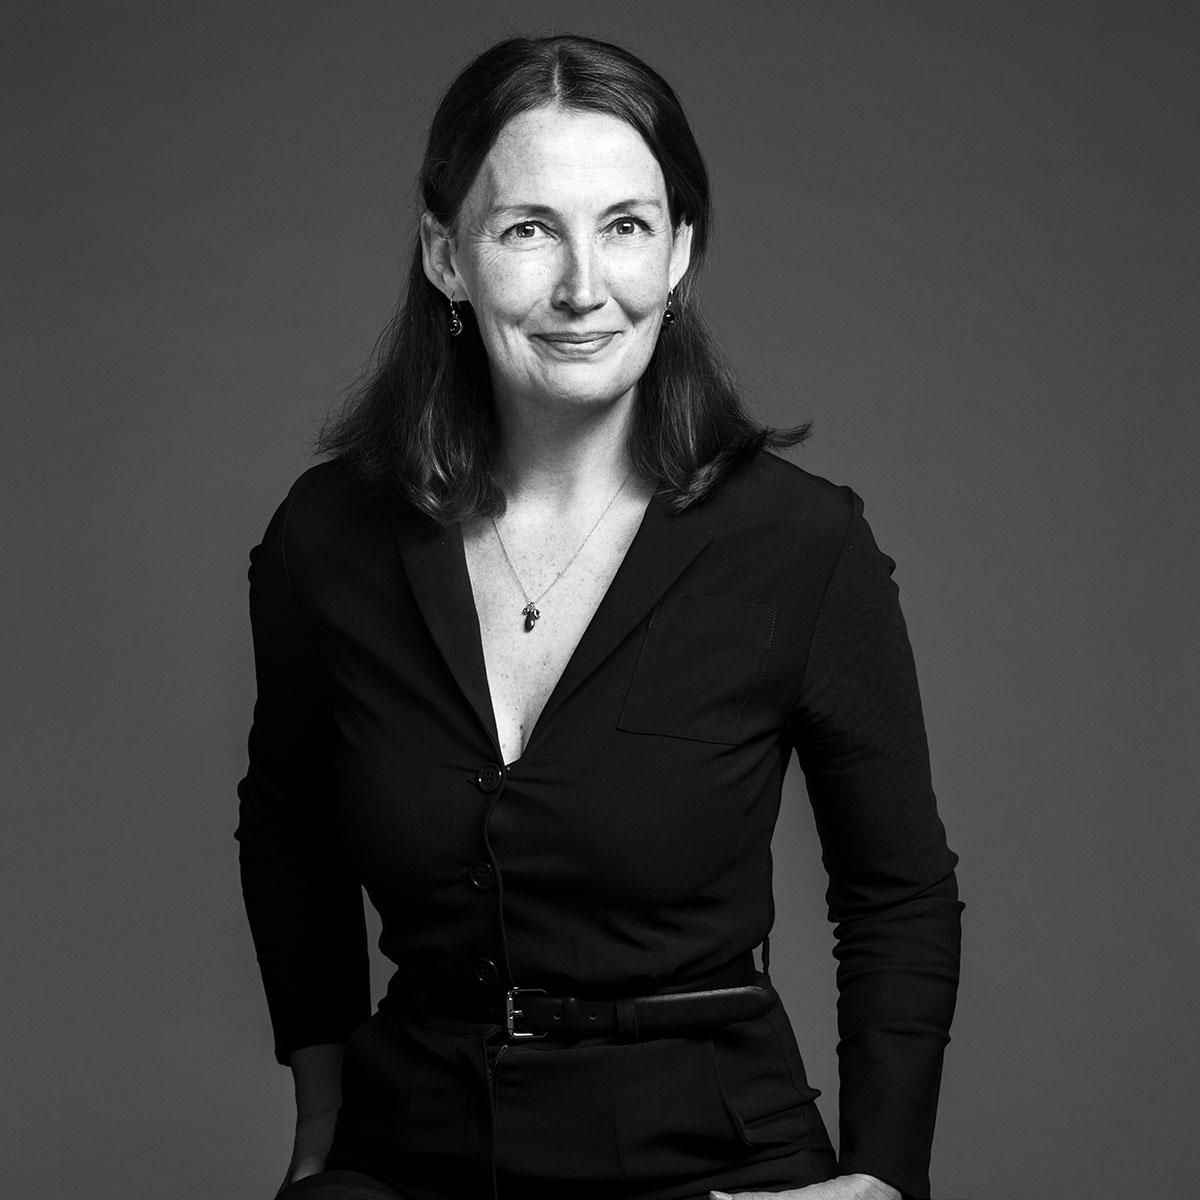 Ida M. Klingvall